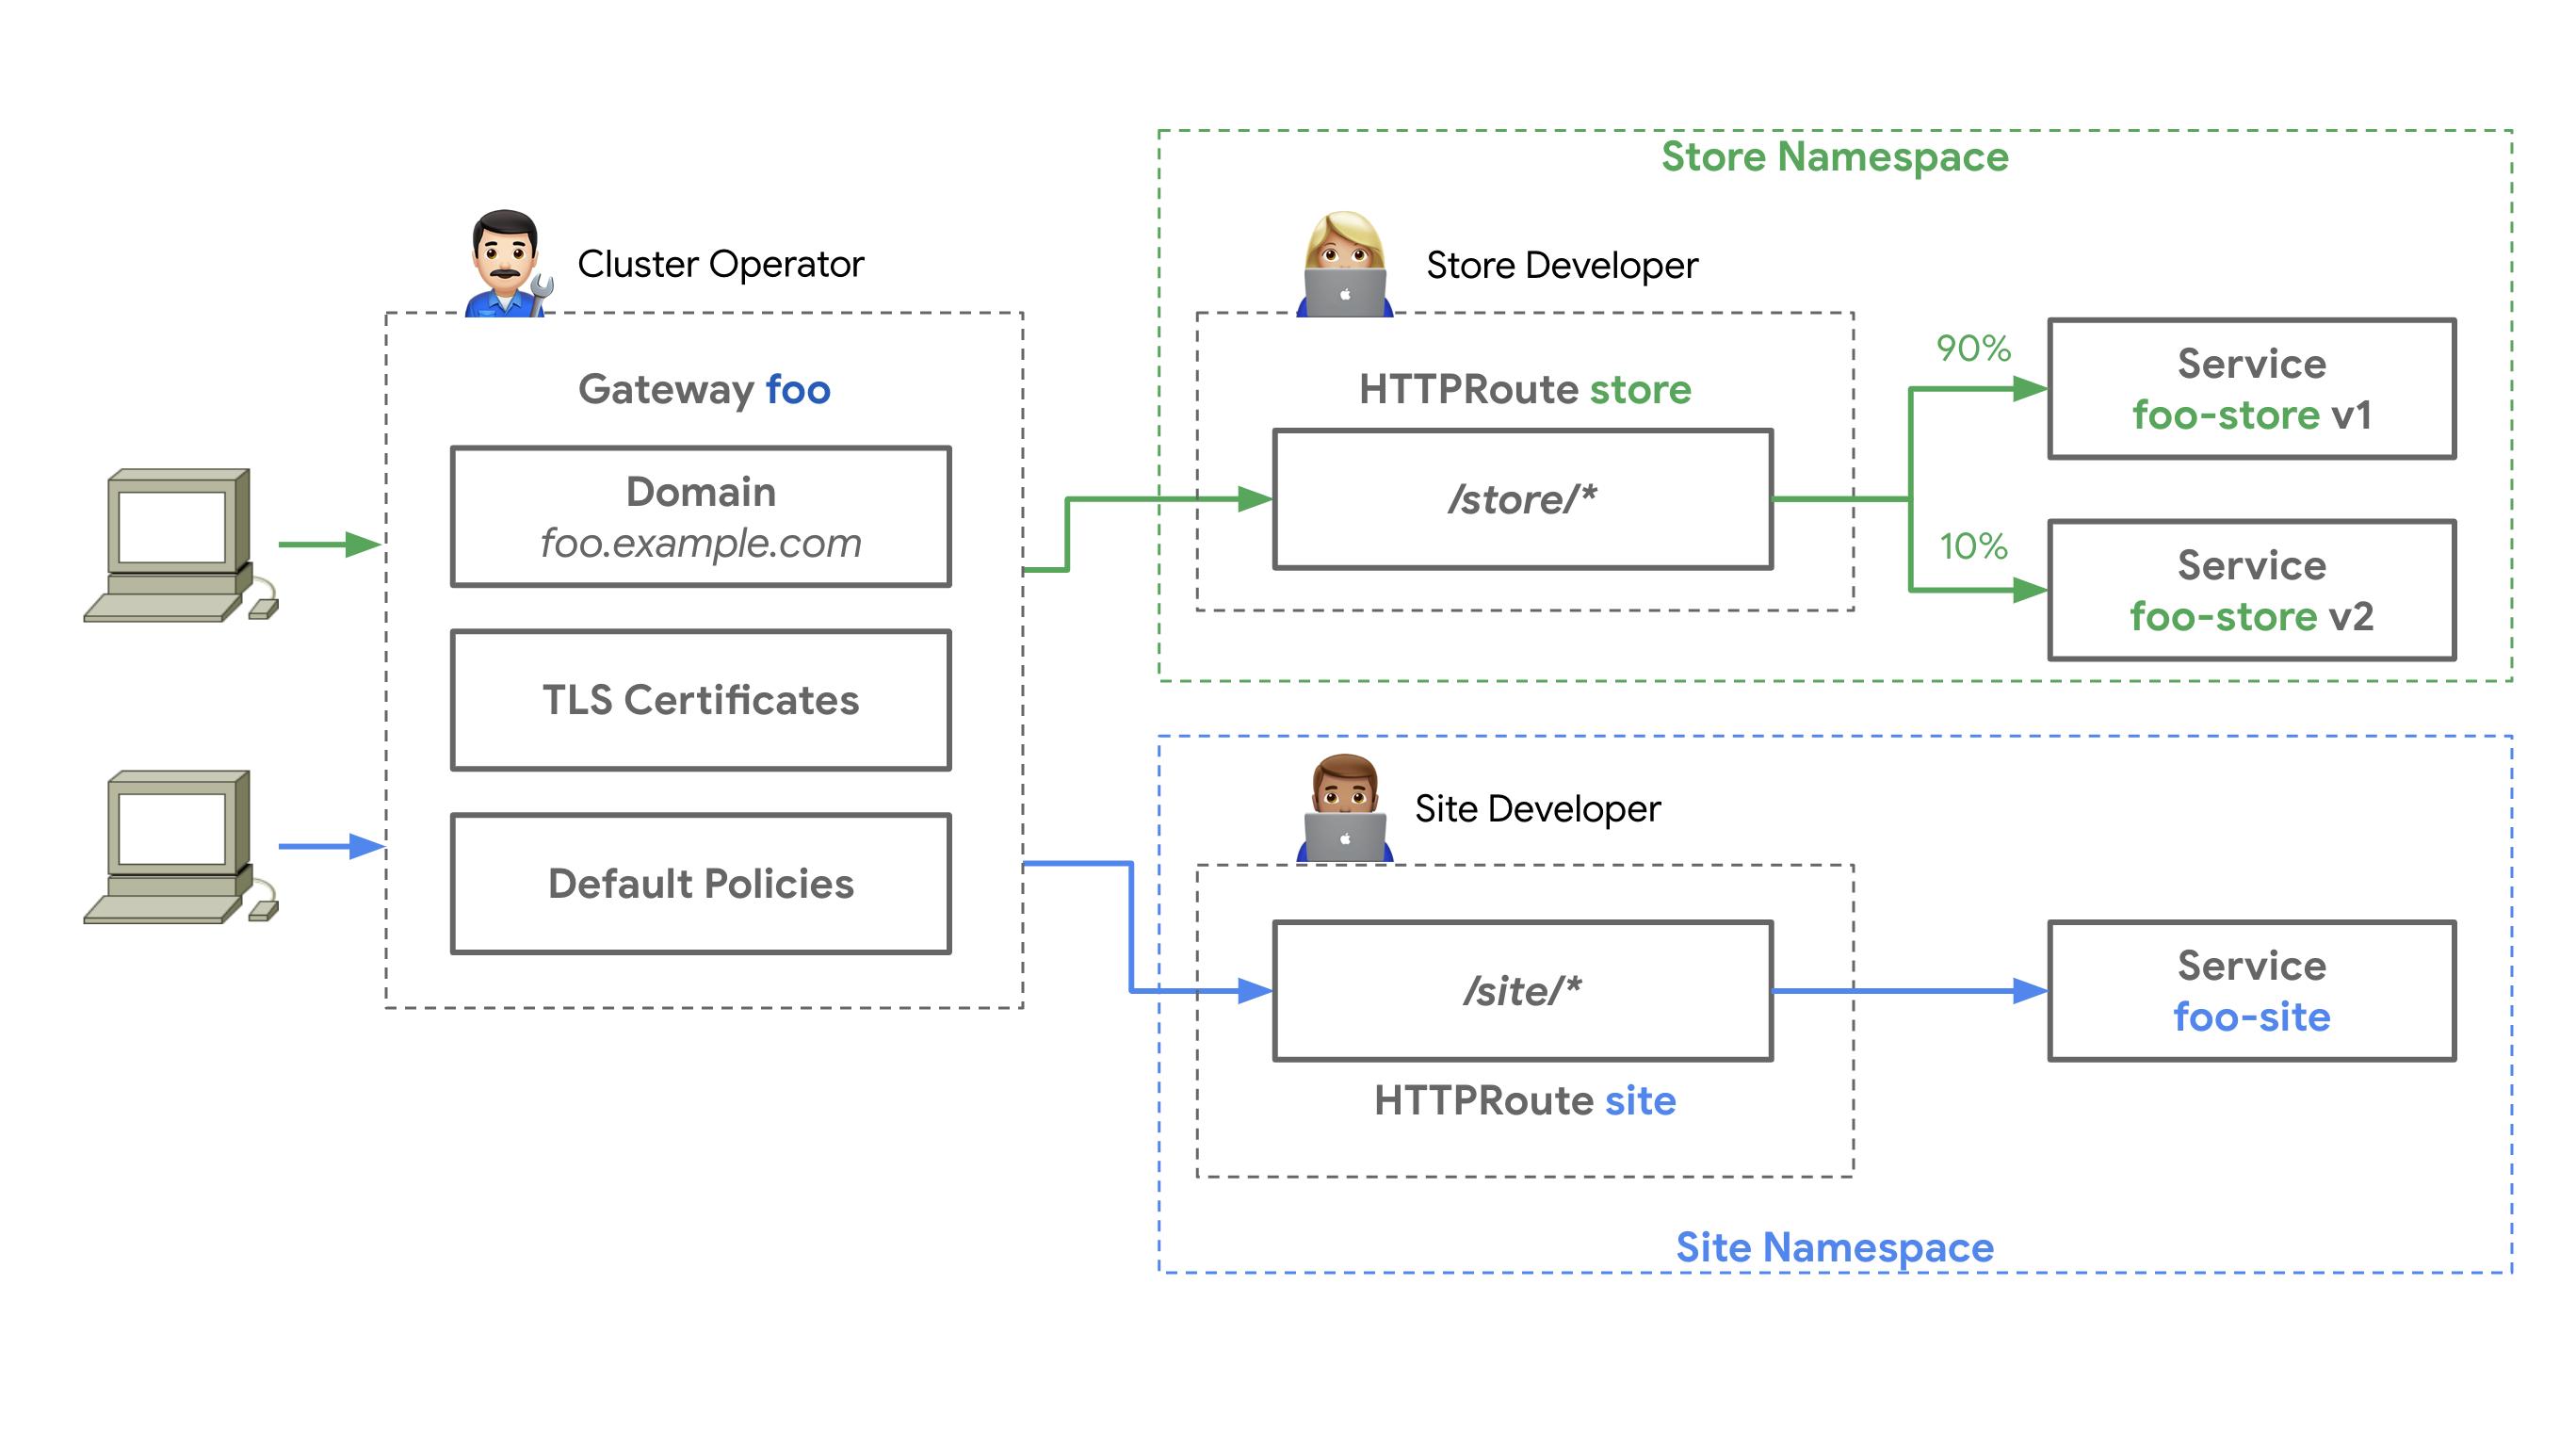 Gateway API Roles